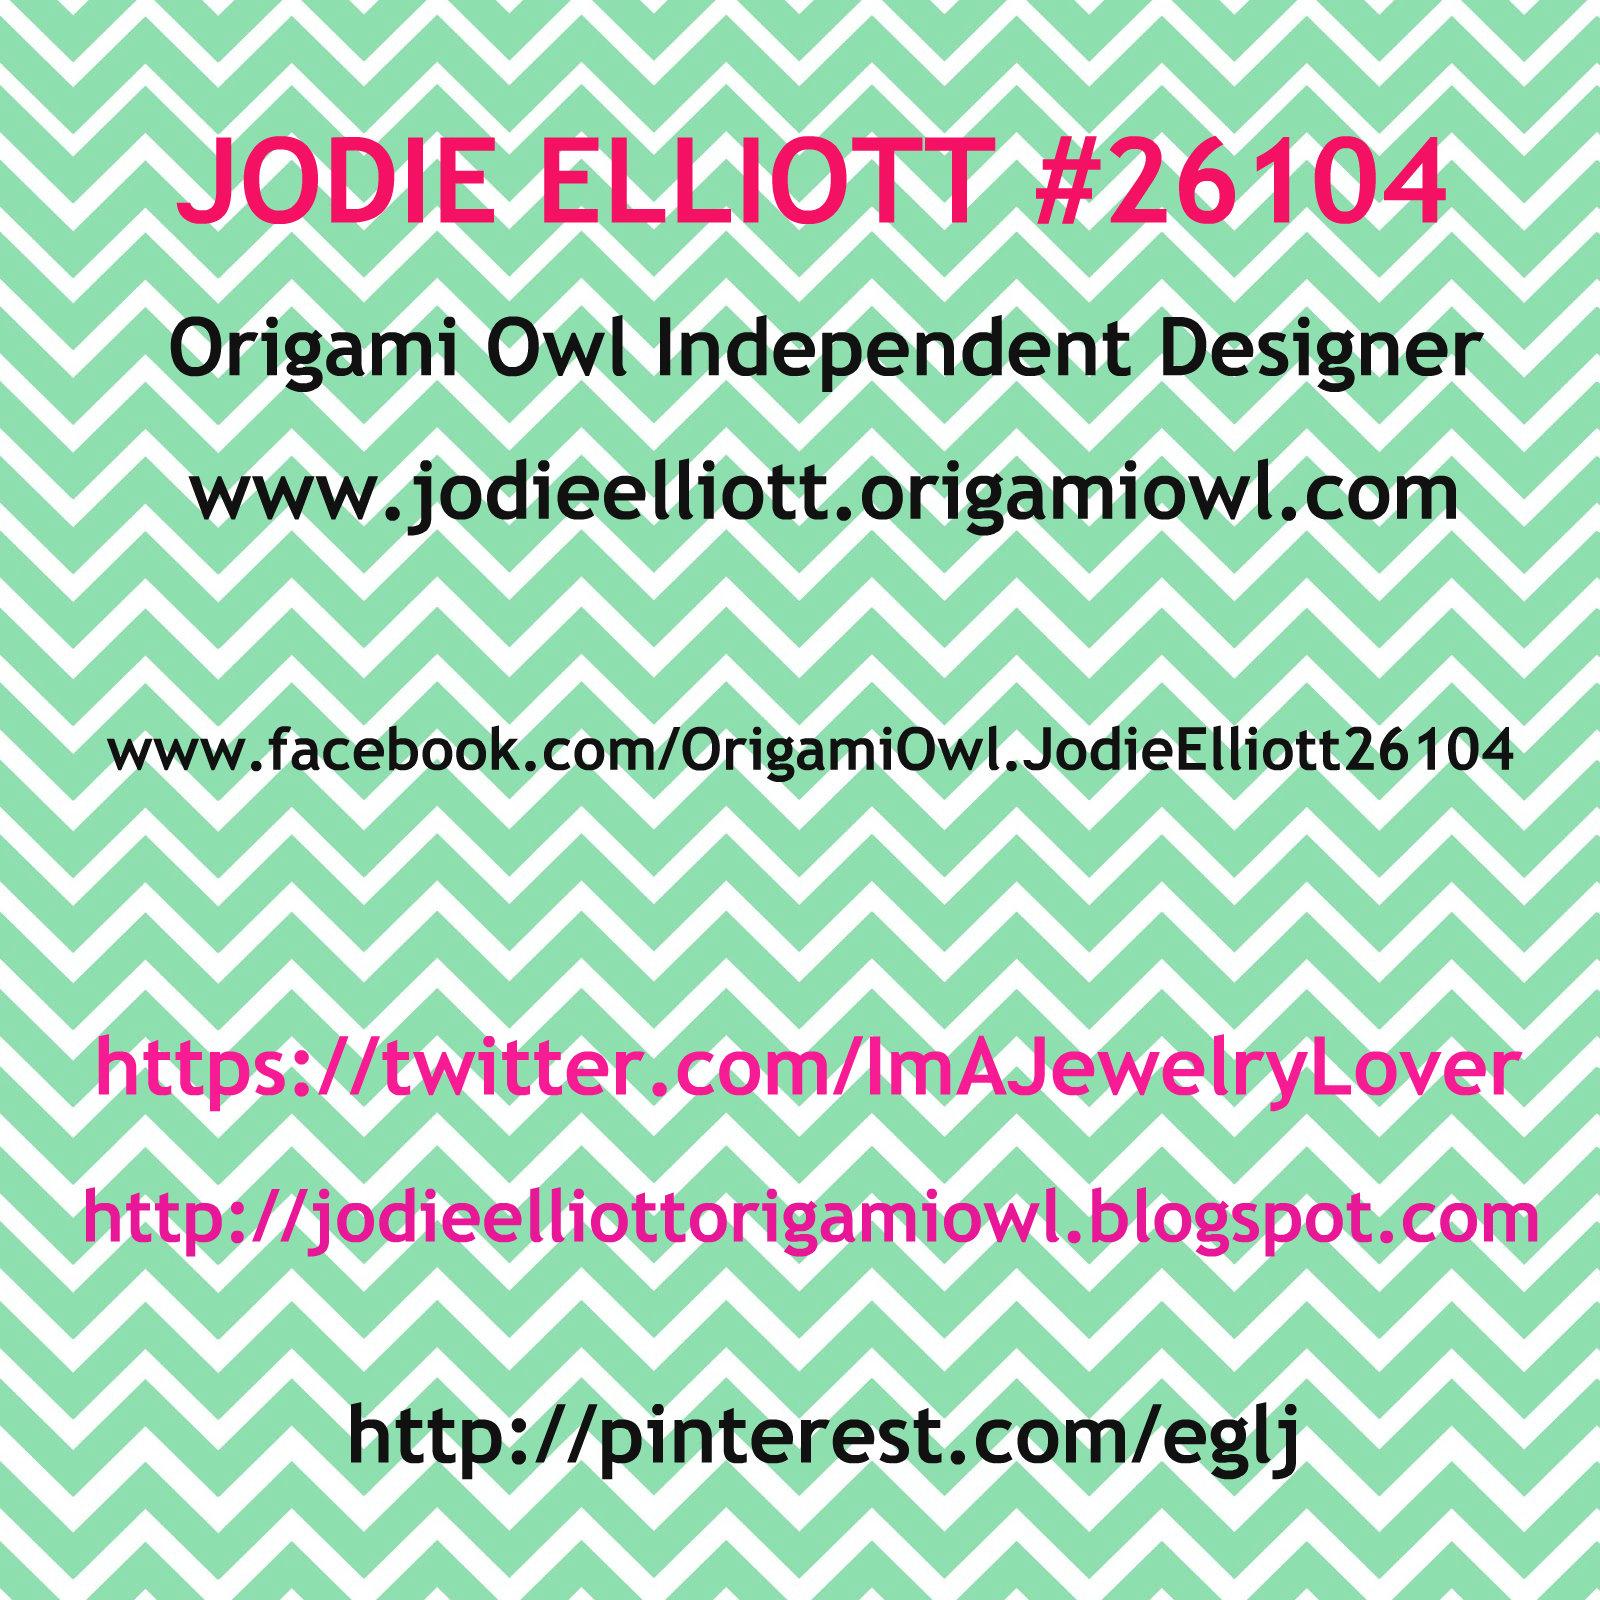 Origami owl independent designer logo